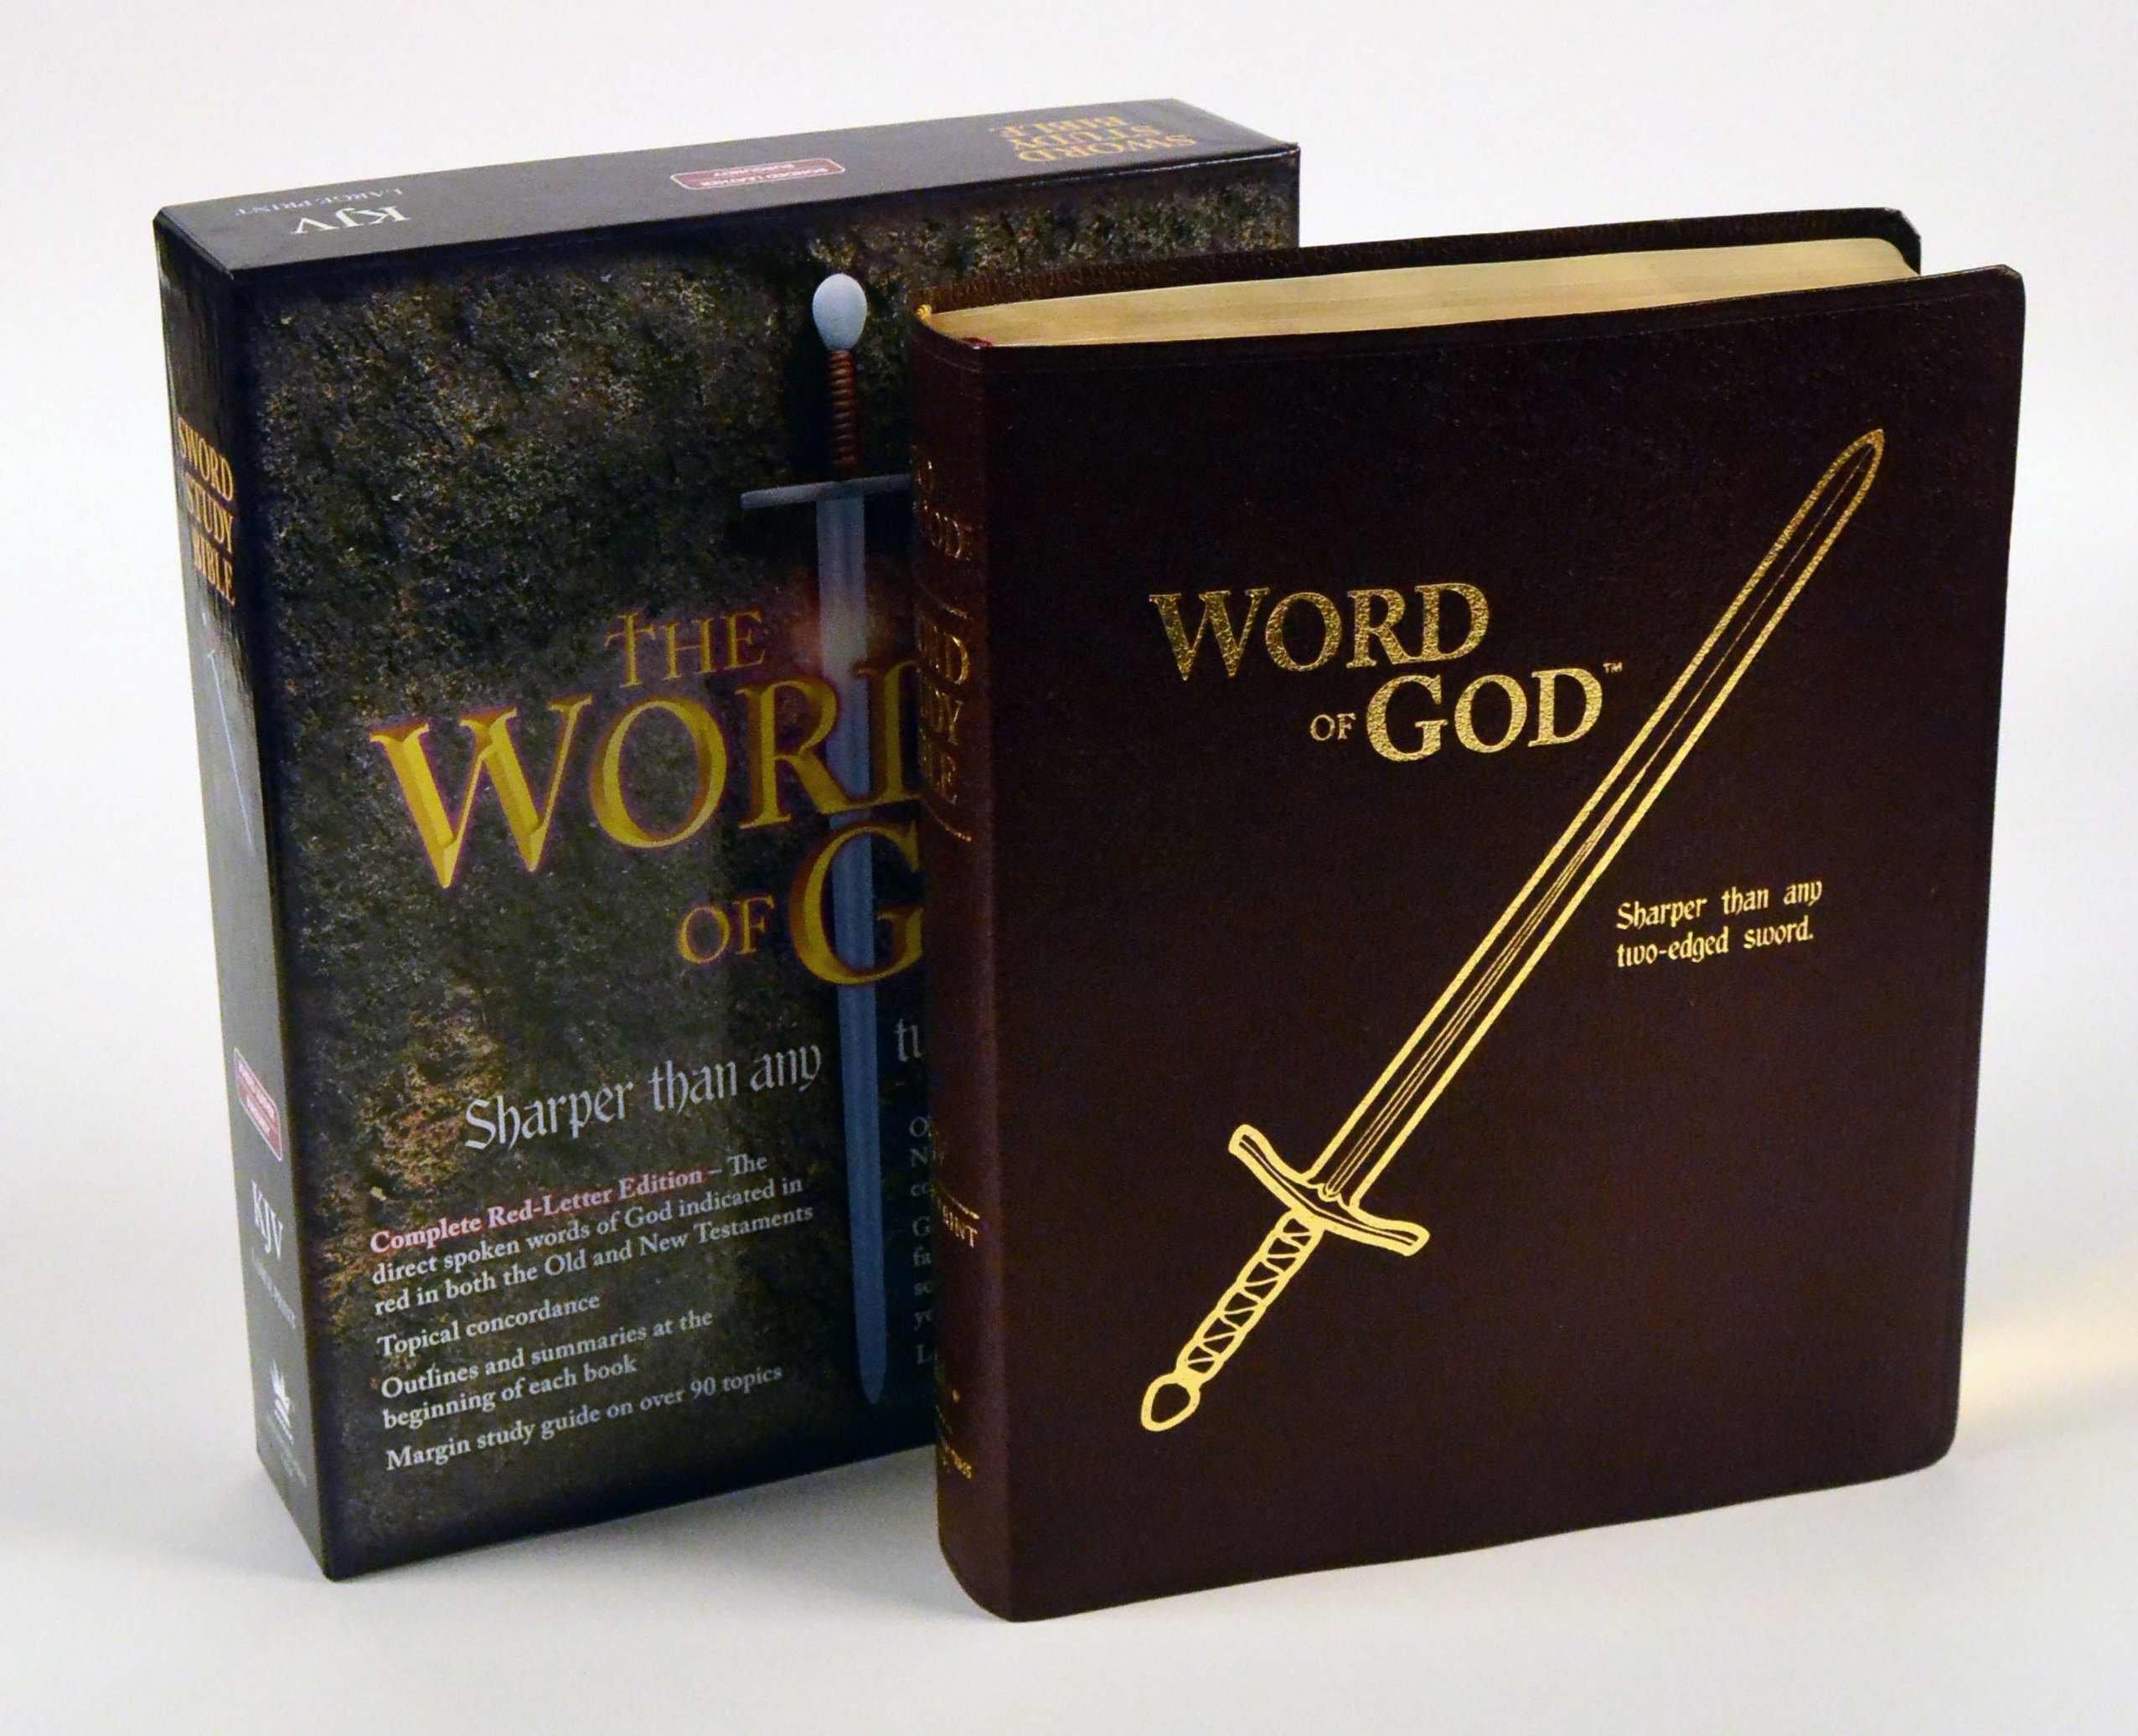 KJV Sword/Word of God/Large Prt-Blk Bond: Gem Publishing